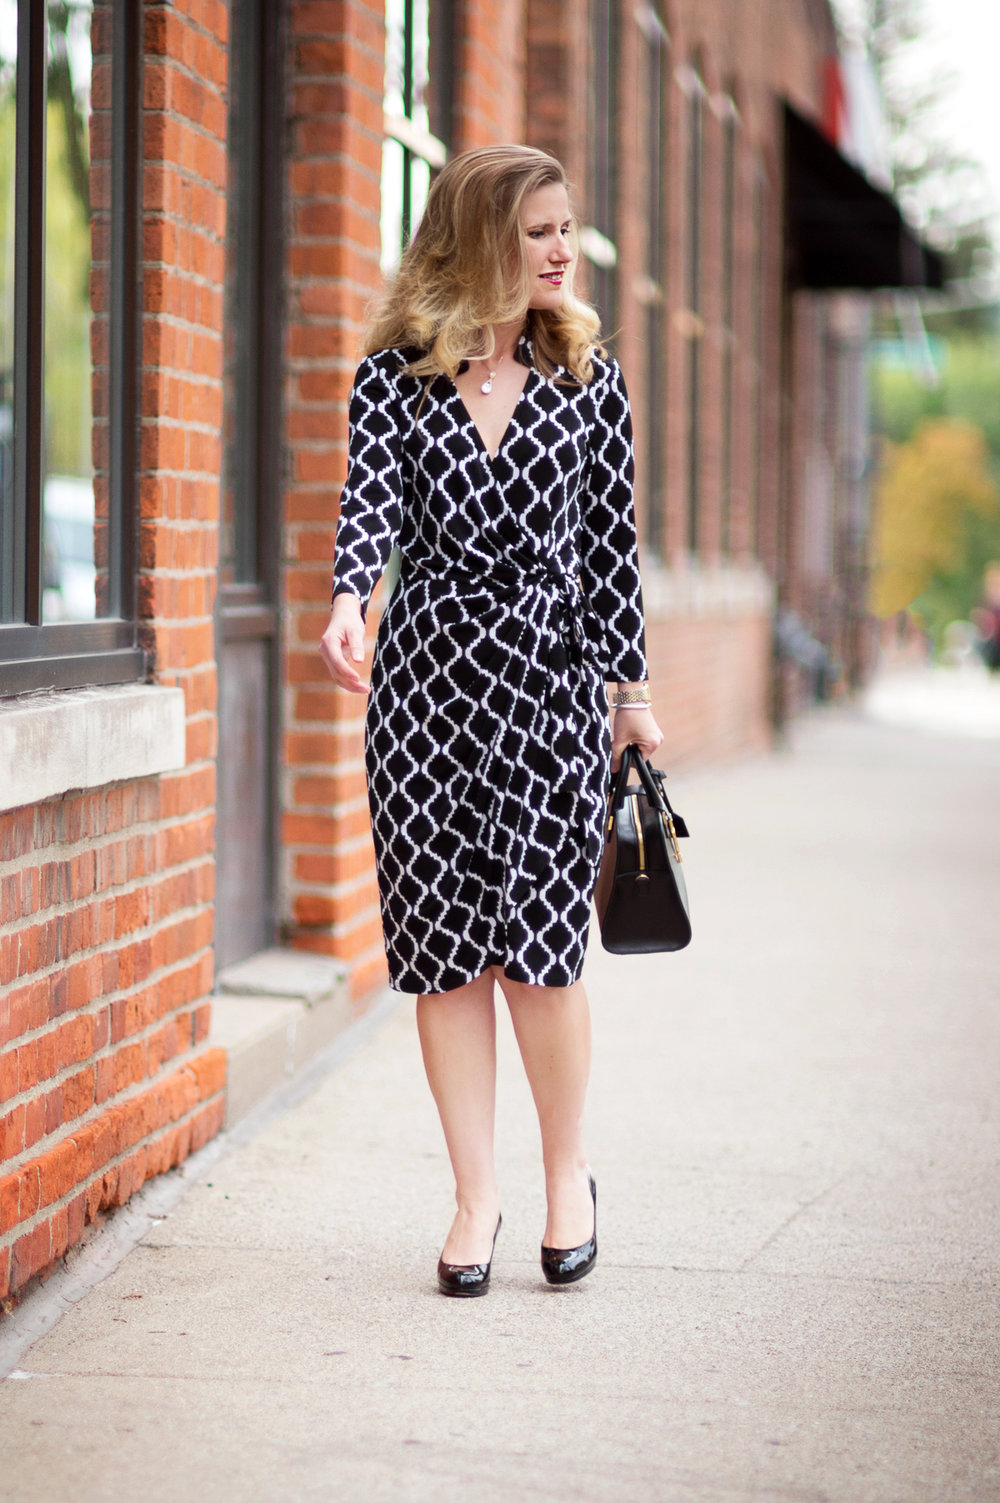 Petite-Fashion-and-Style-Blog---Maggy-London-Philomena-Dress-9.jpg